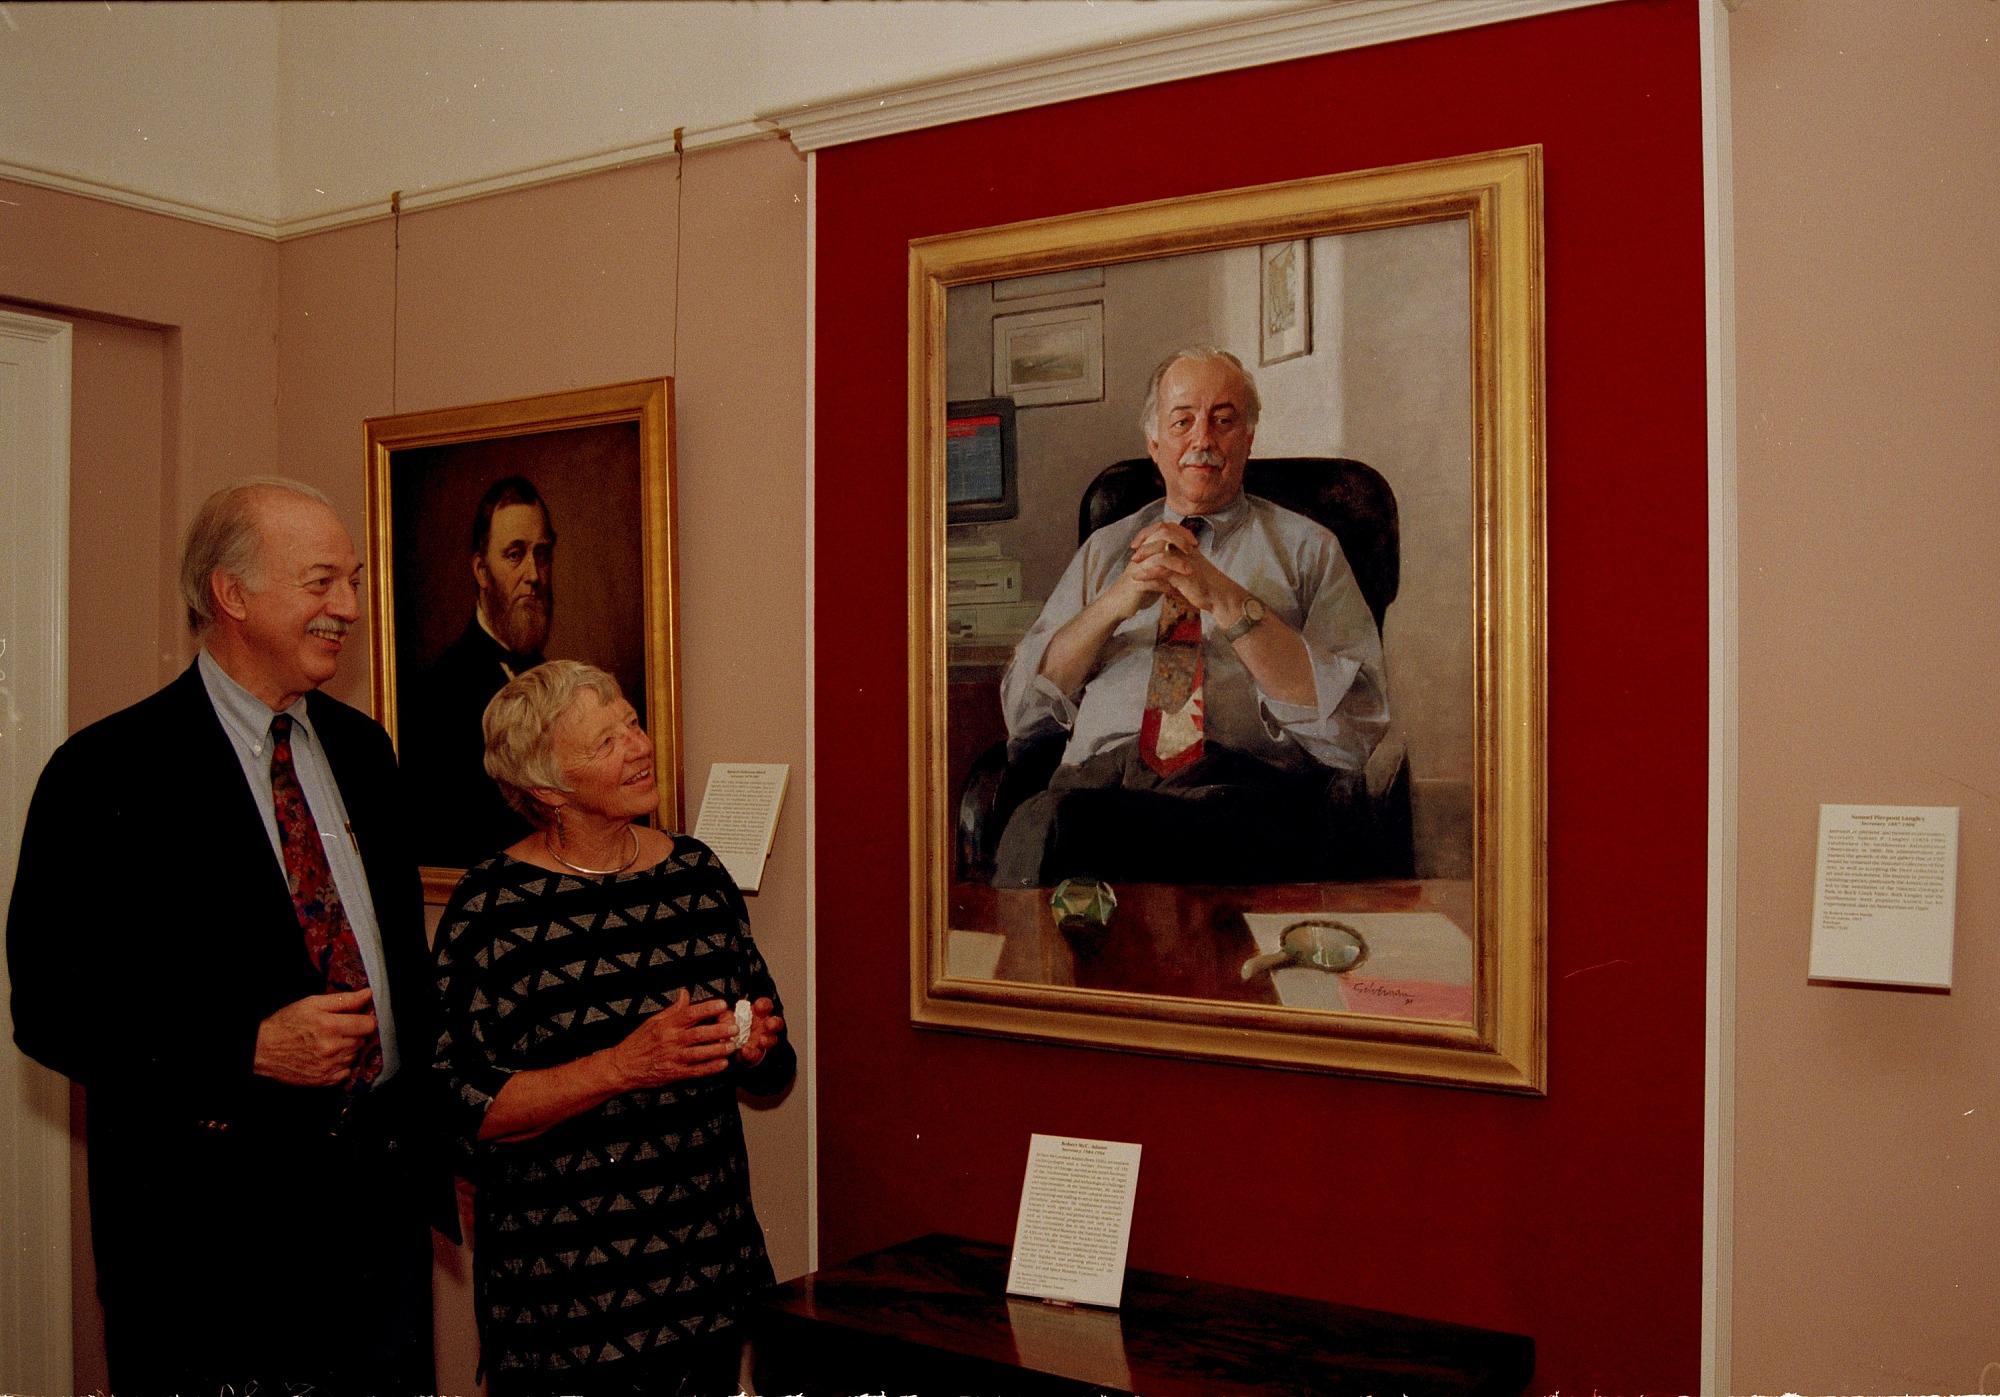 Secretary Adams and his Wife